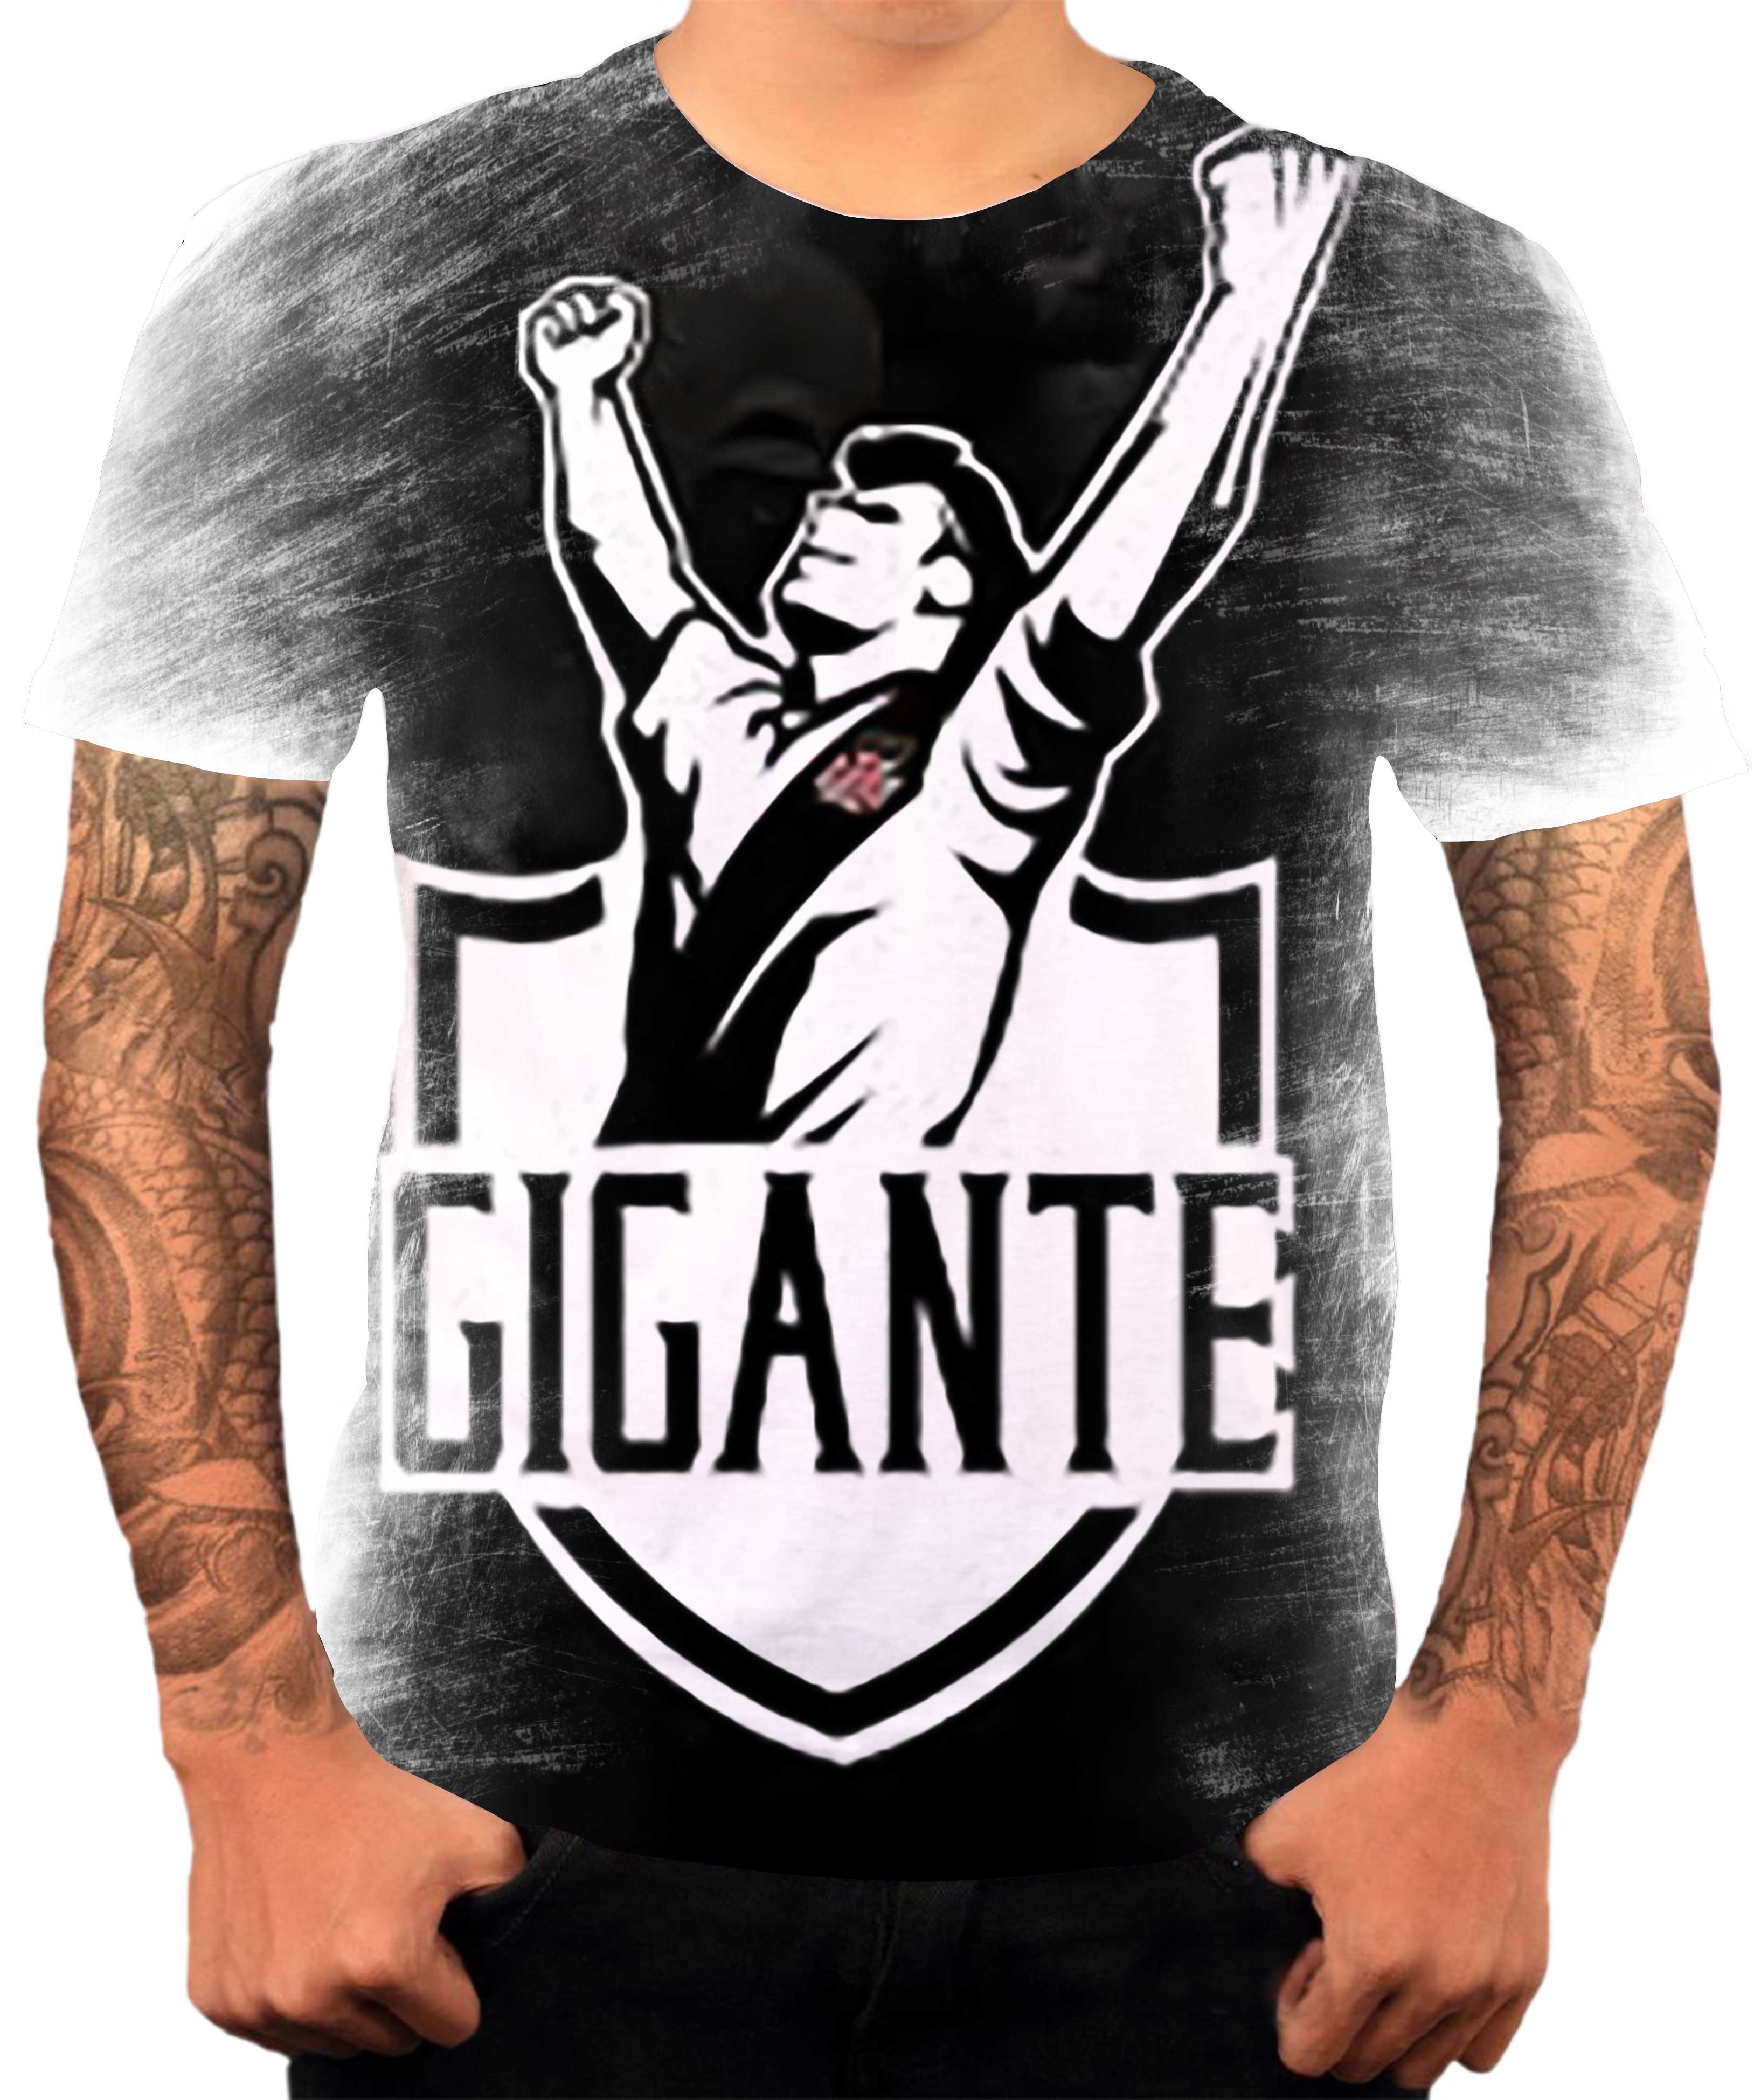 c835dc0dd3b3d Camisa Camiseta Personalizada Time De Futebol Real Madrid 2 no Elo7 ...